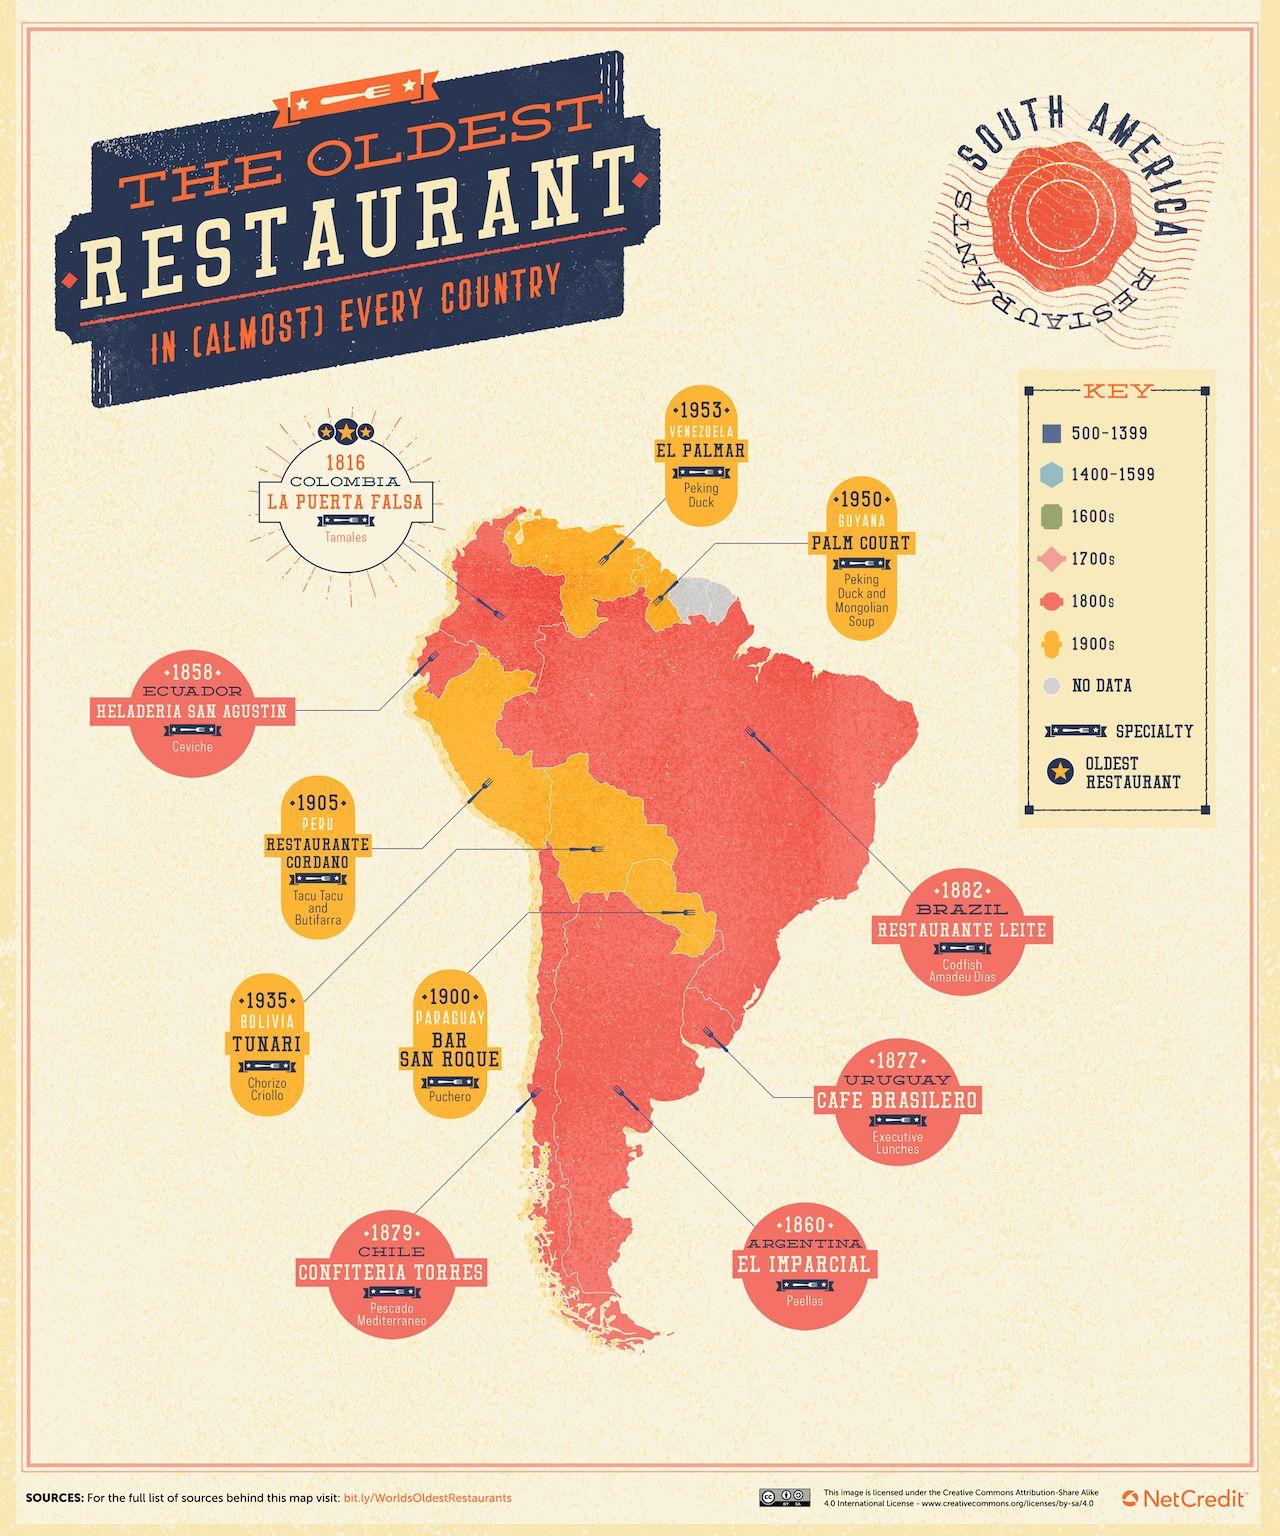 oldest-restaurant-south-america